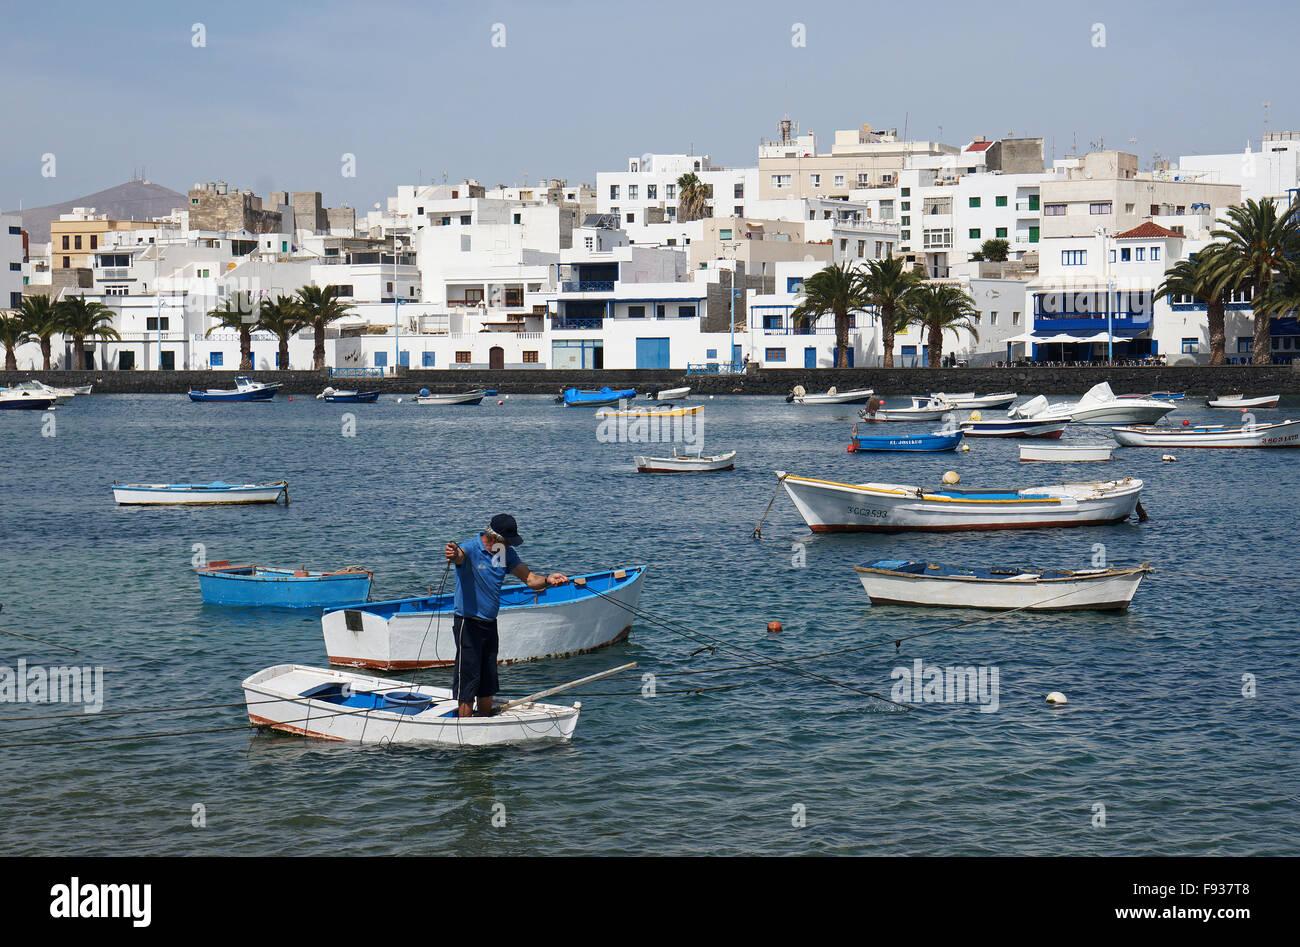 Inner harbour, Arrecife, Lanzarote, Canary Islands - Stock Image